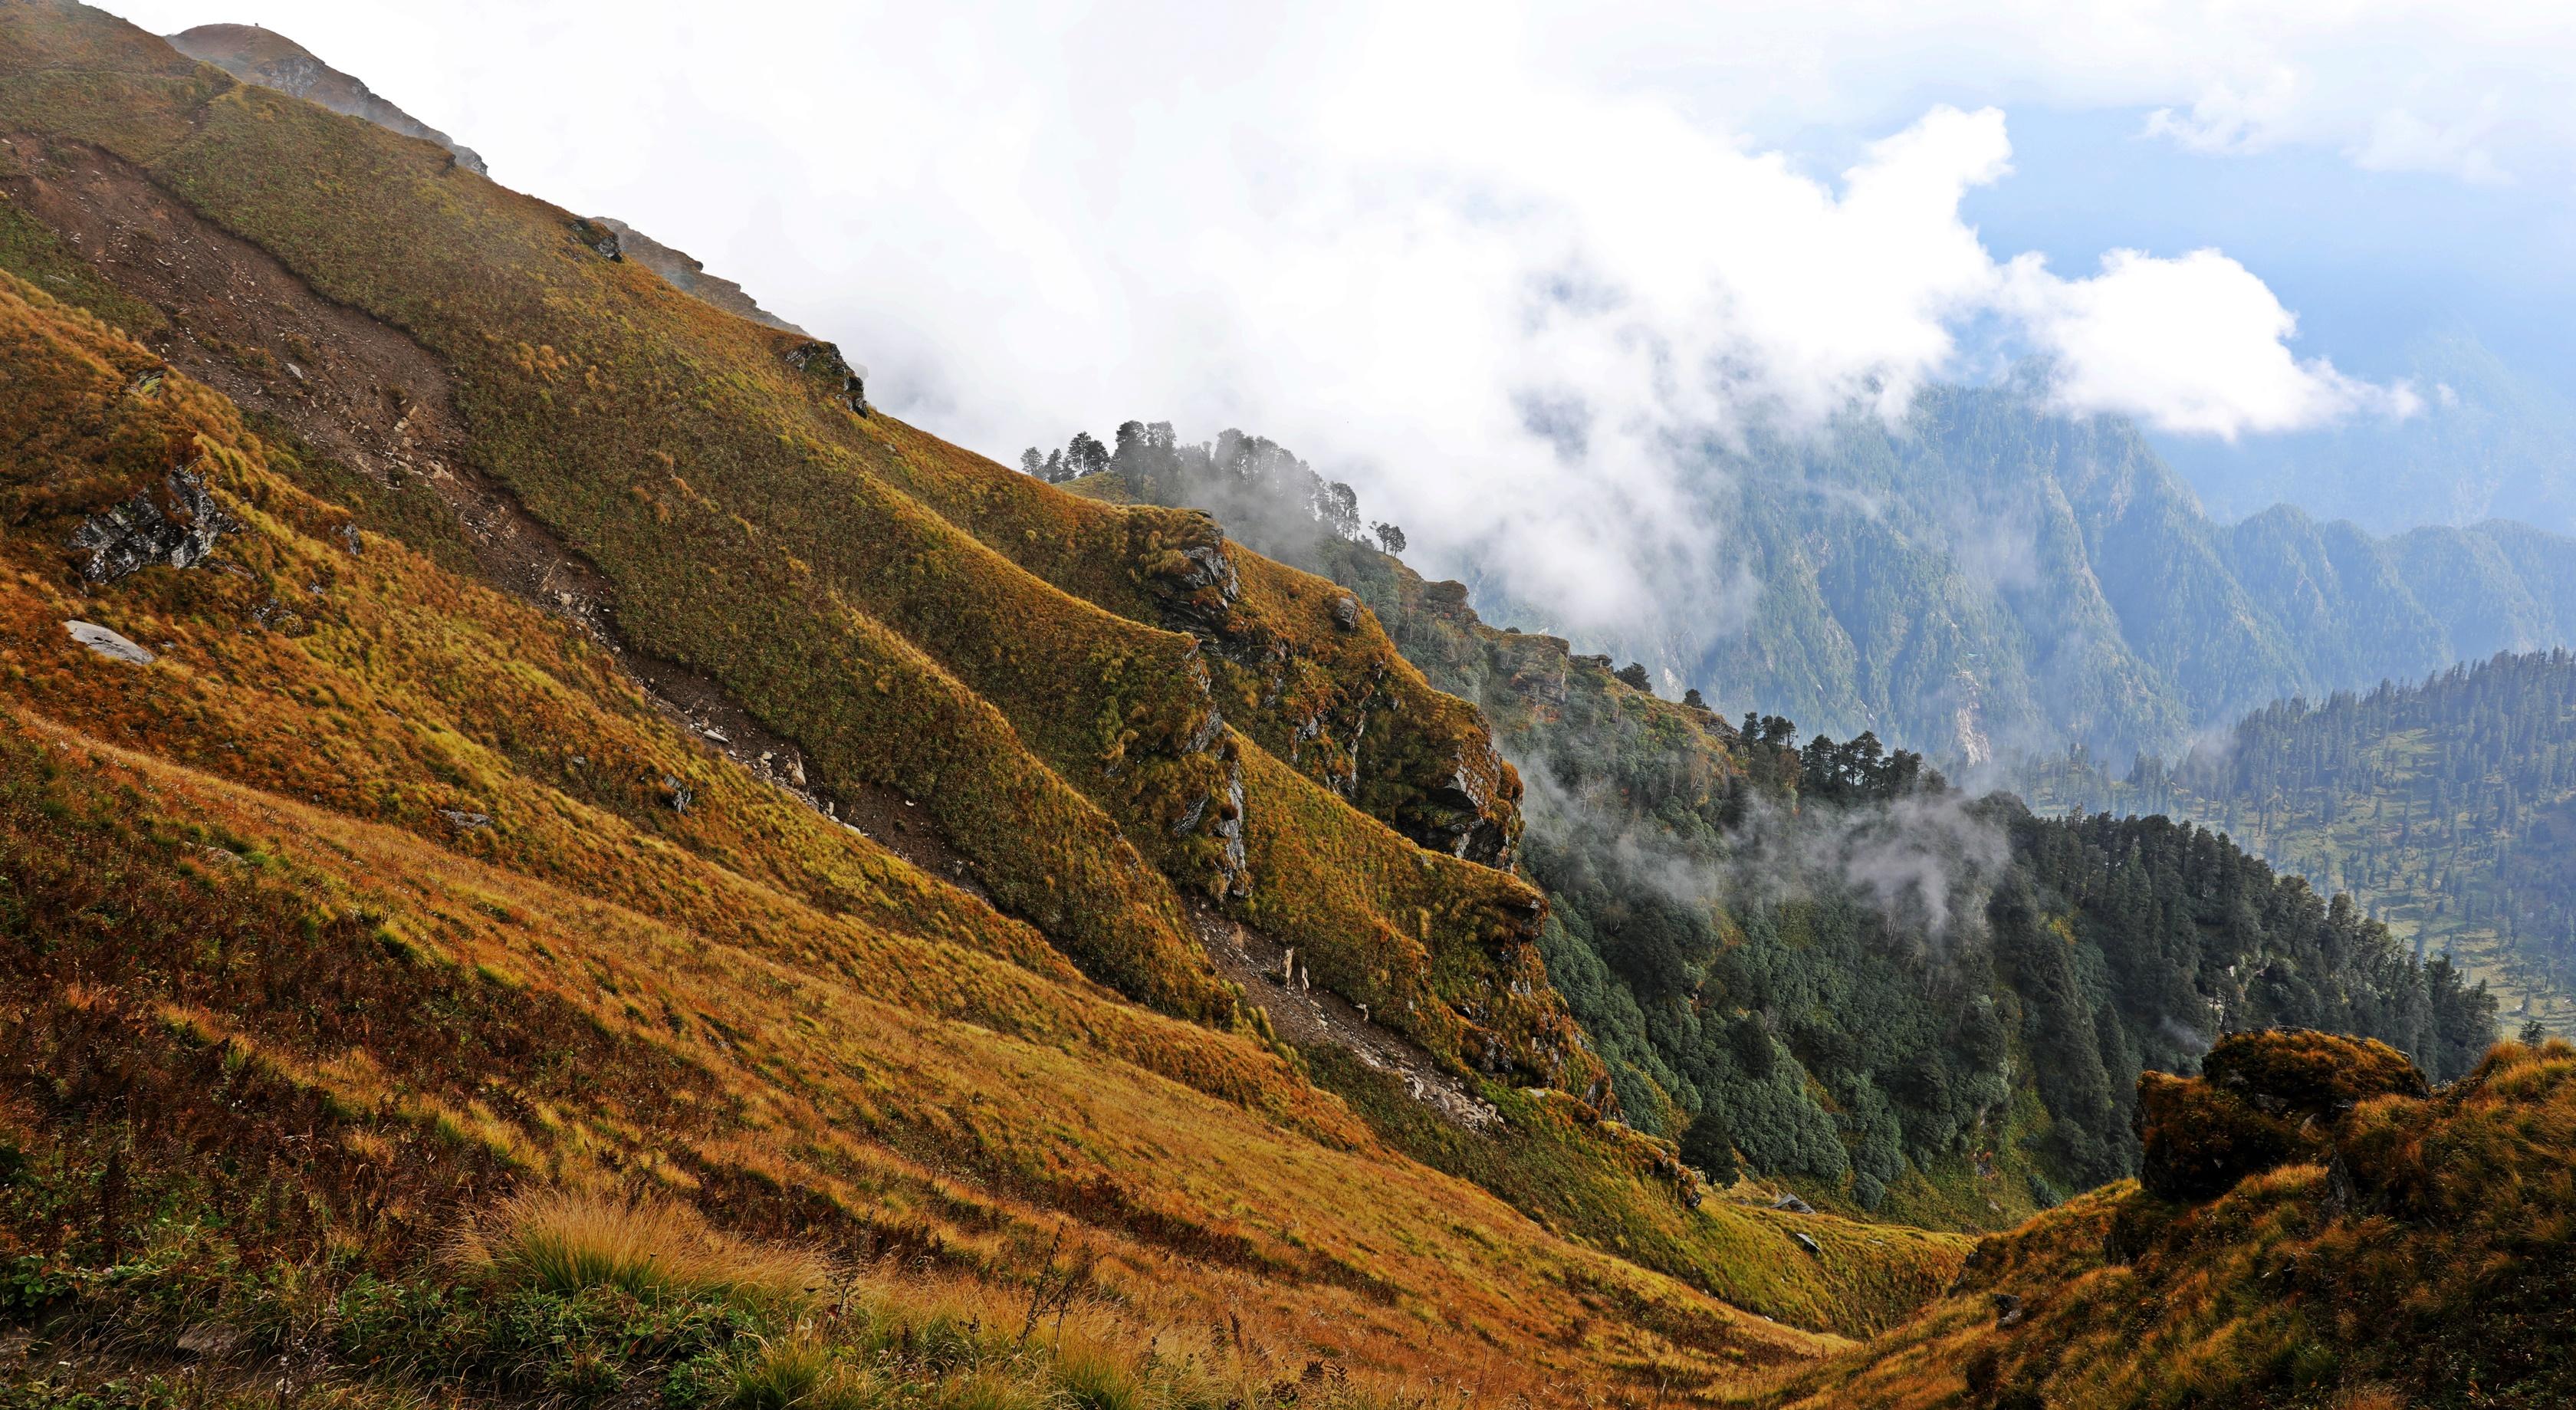 Mountain ridge on the Naggar to Malana Trek